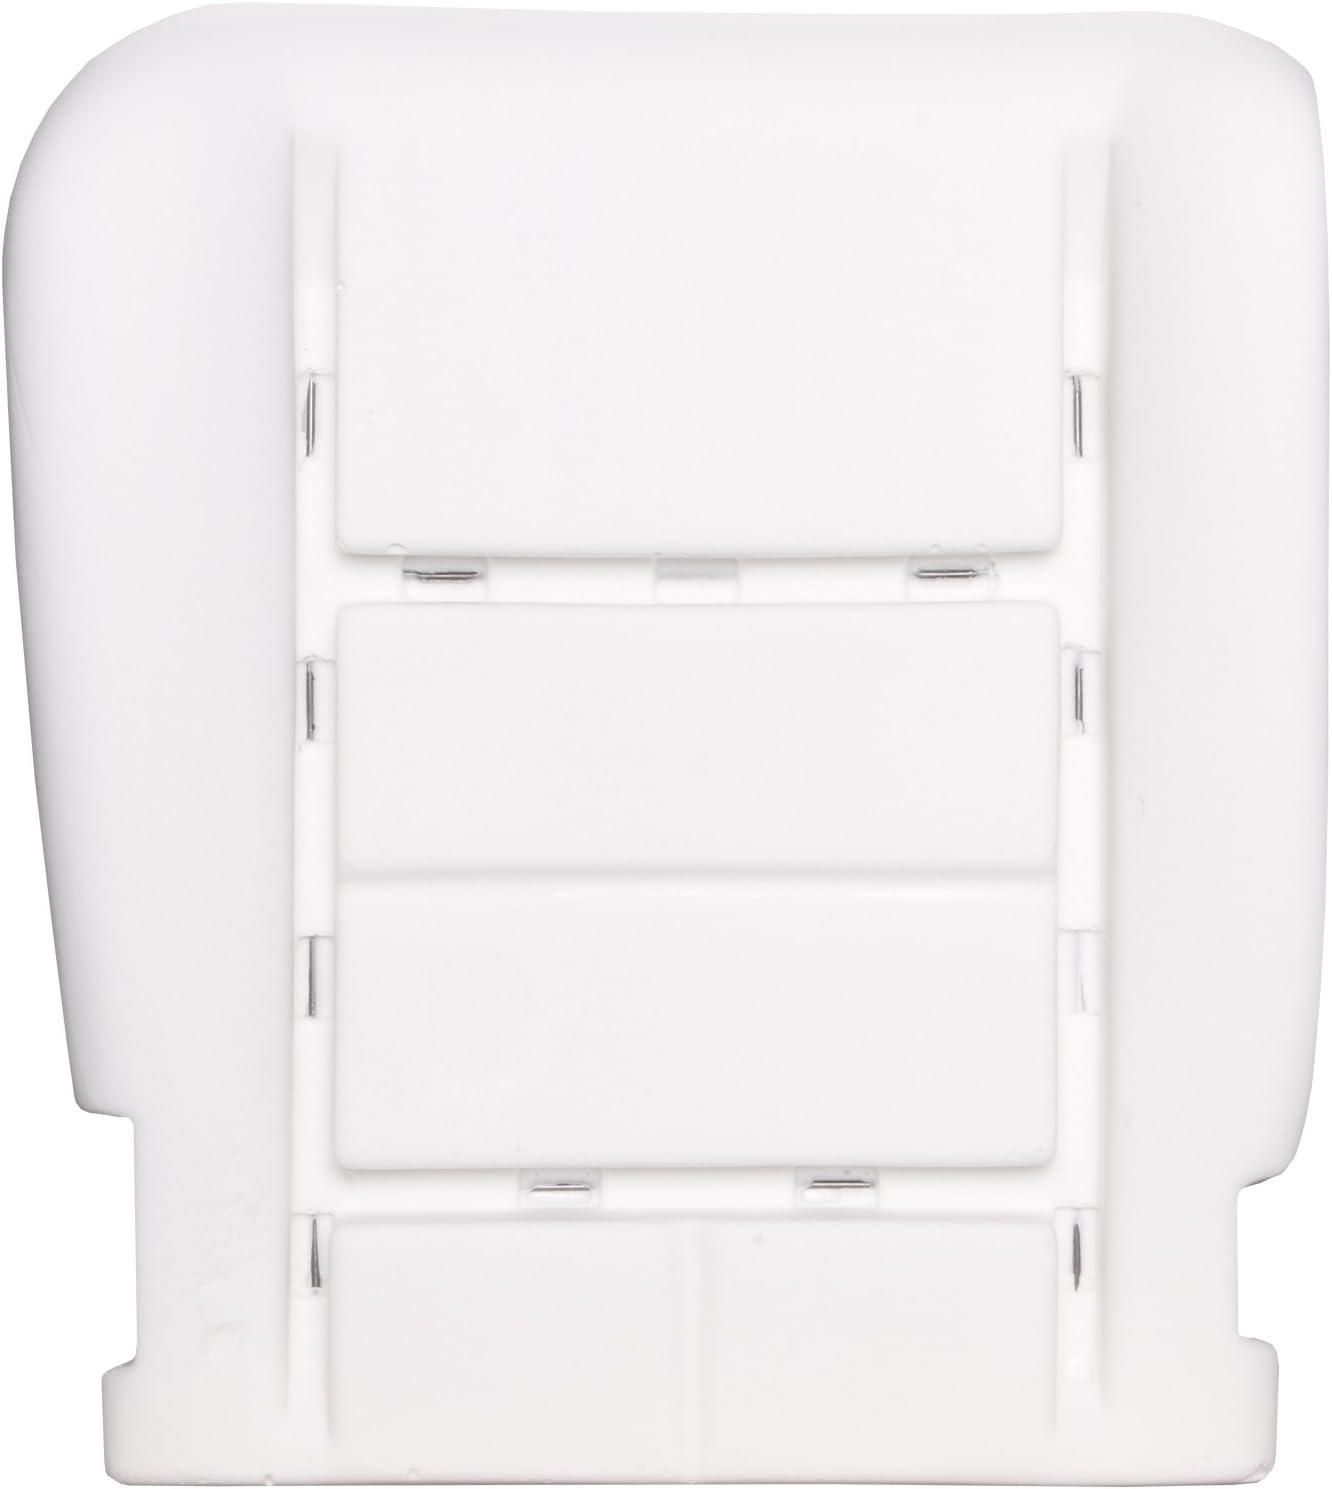 The Seat Shop Durofoam Weekly update Replacement Driver Foam Bottom security Cushi